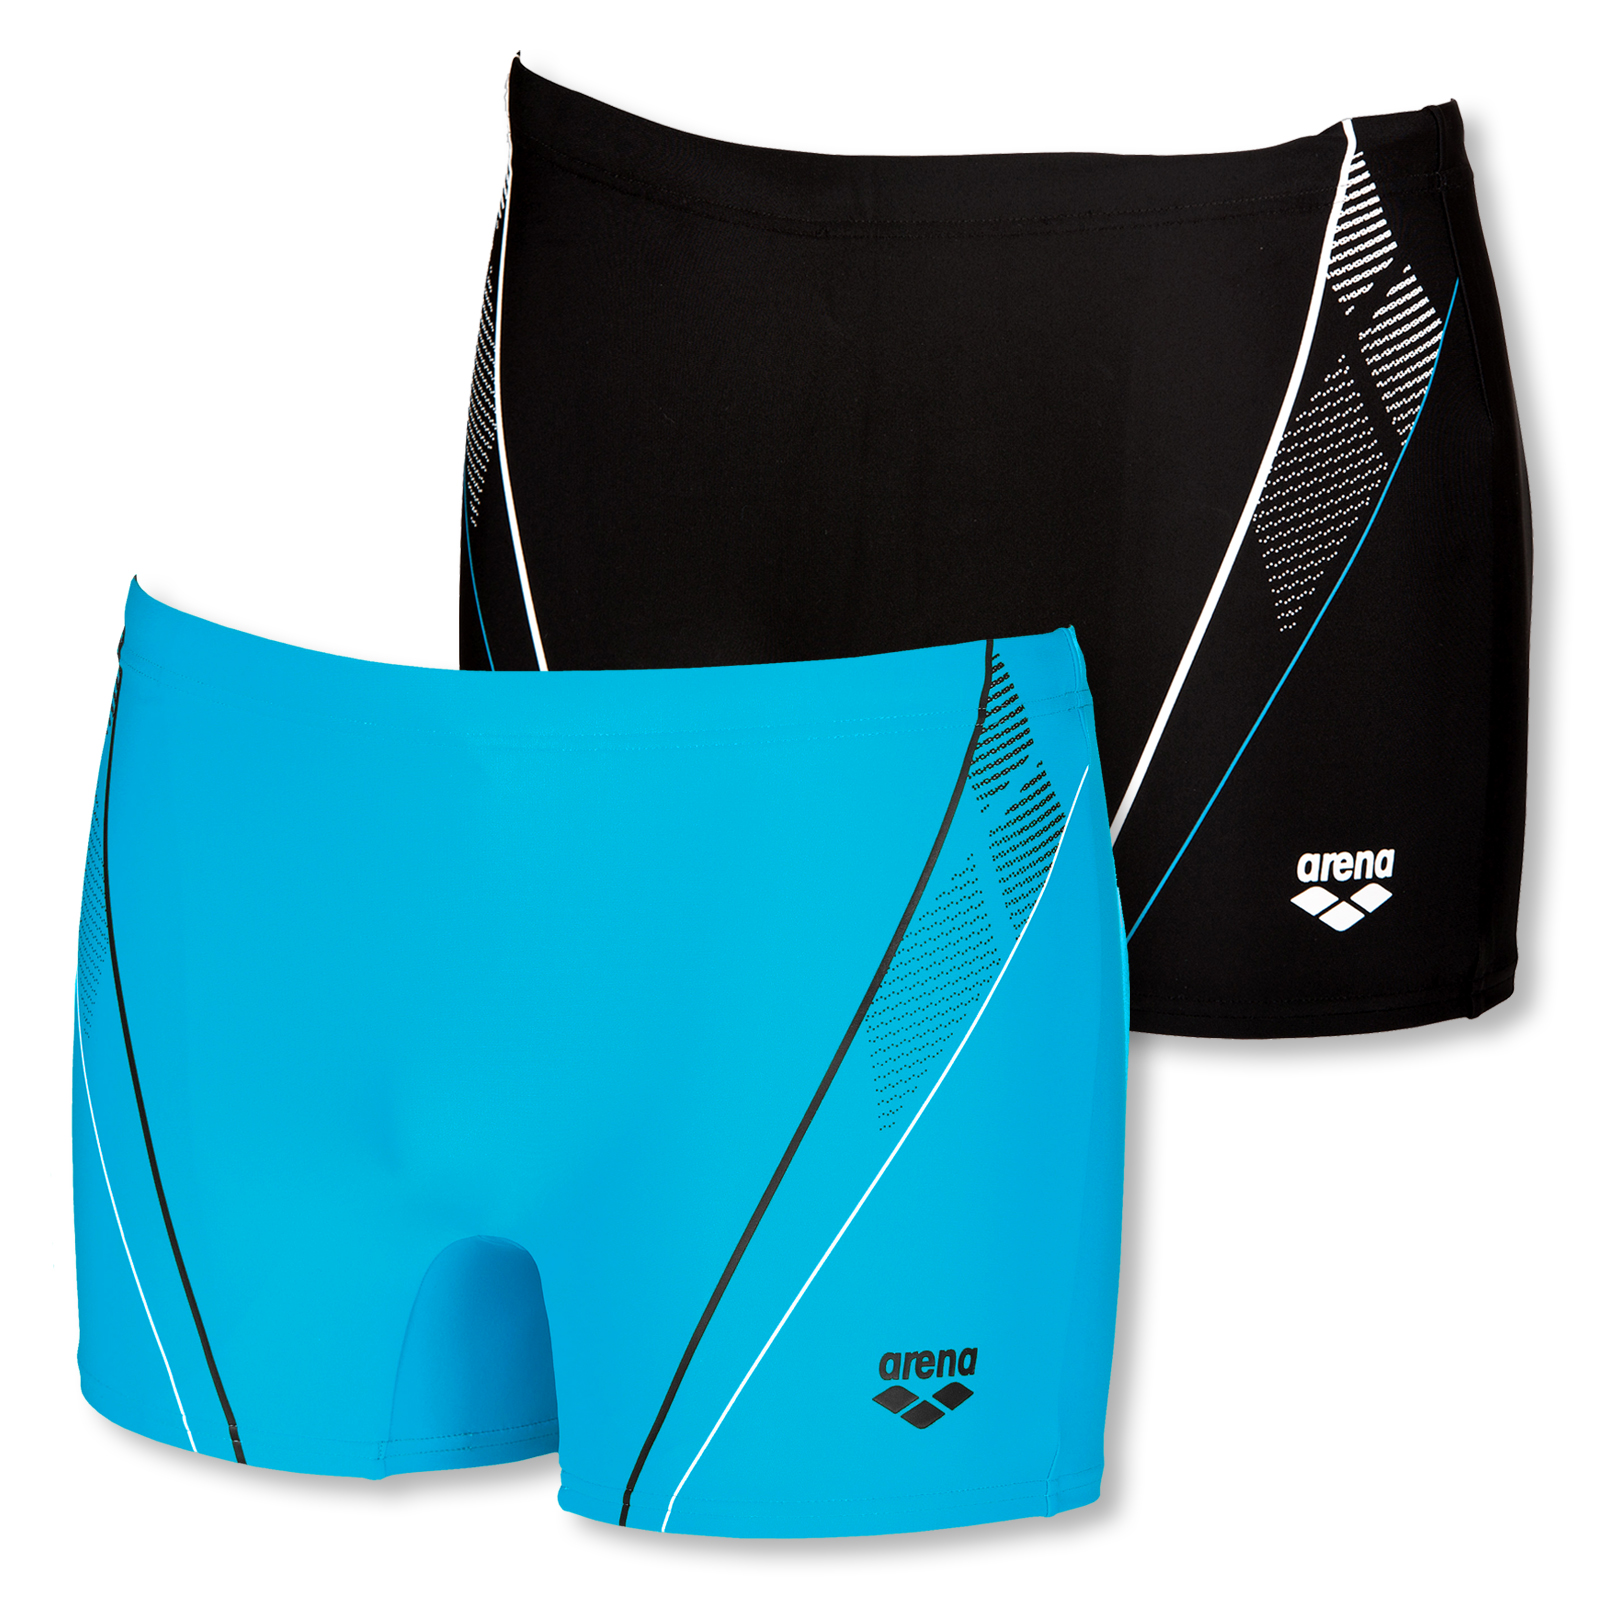 Arena Herren Badehose Skid Short 2A233 S M L XL 2XL 3XL in black / turquoise / white